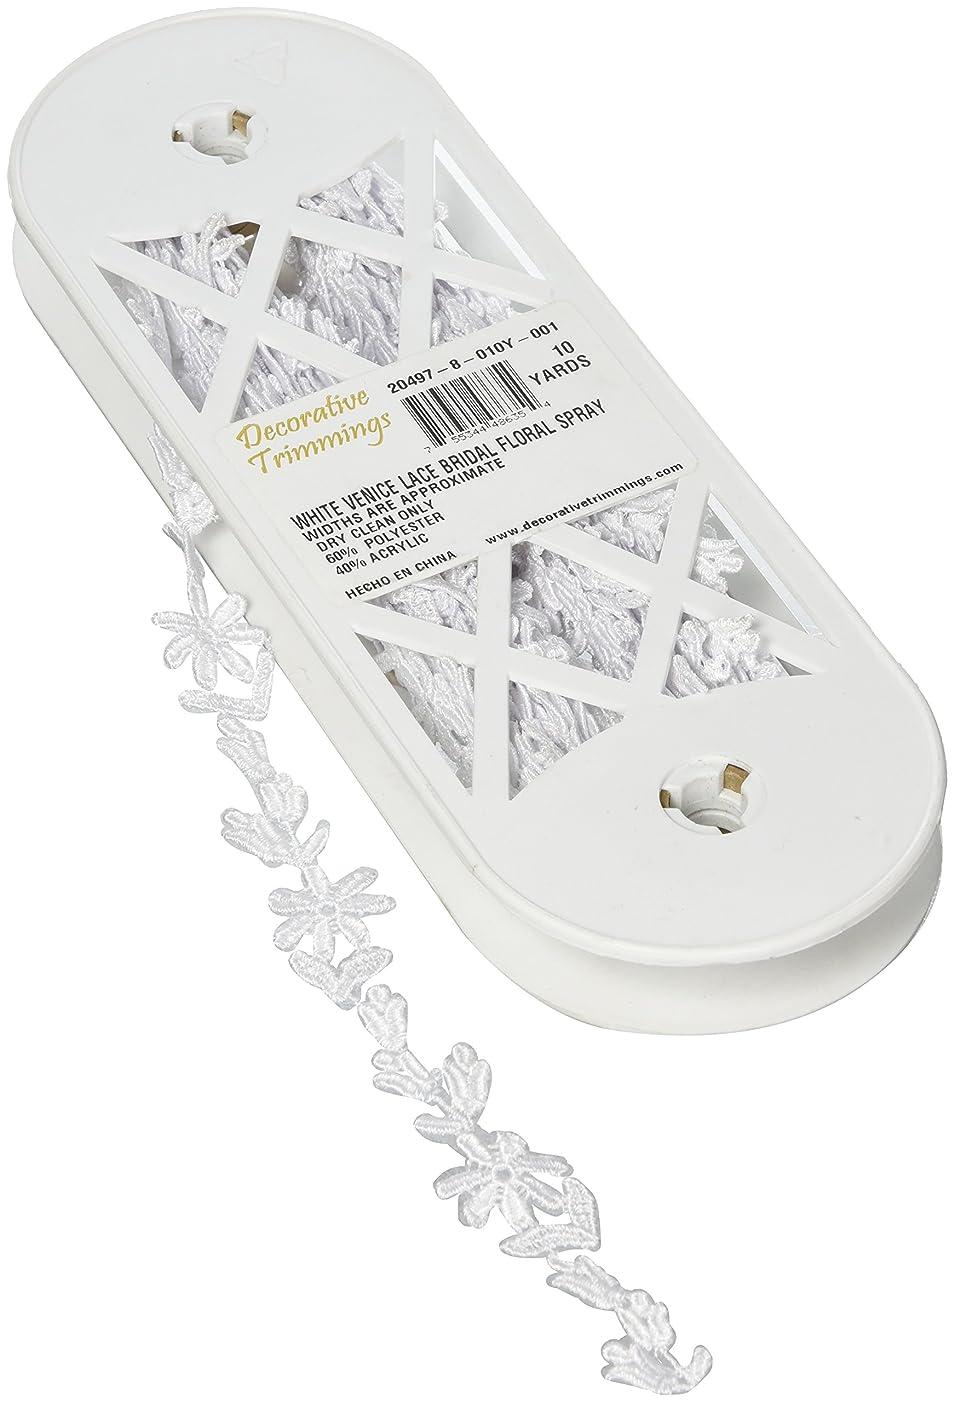 Decorative Trimmings White Floral Spray Bridal Venice Lace Trim 1